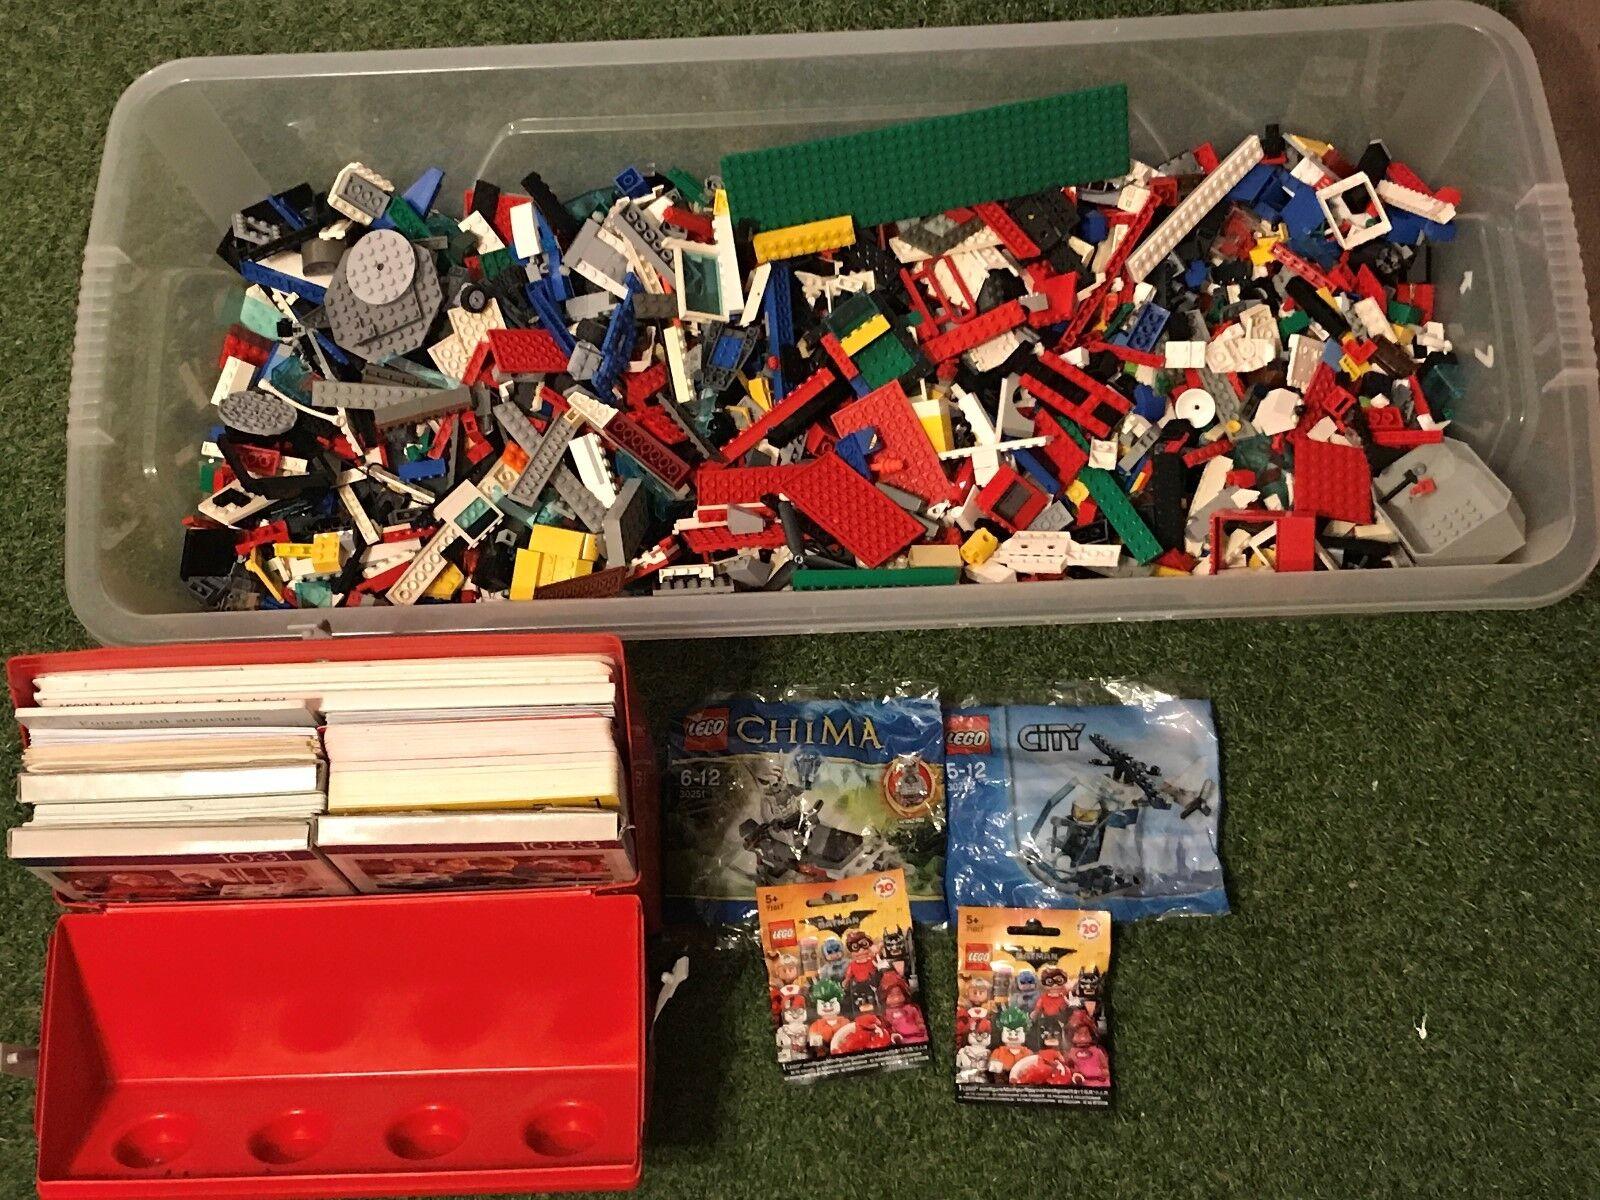 SCHOOL CLASSROOM EDUCATION SET DACTA TECHNIC 9475 1053 9604 1031 1033+ +3Kg LEGO